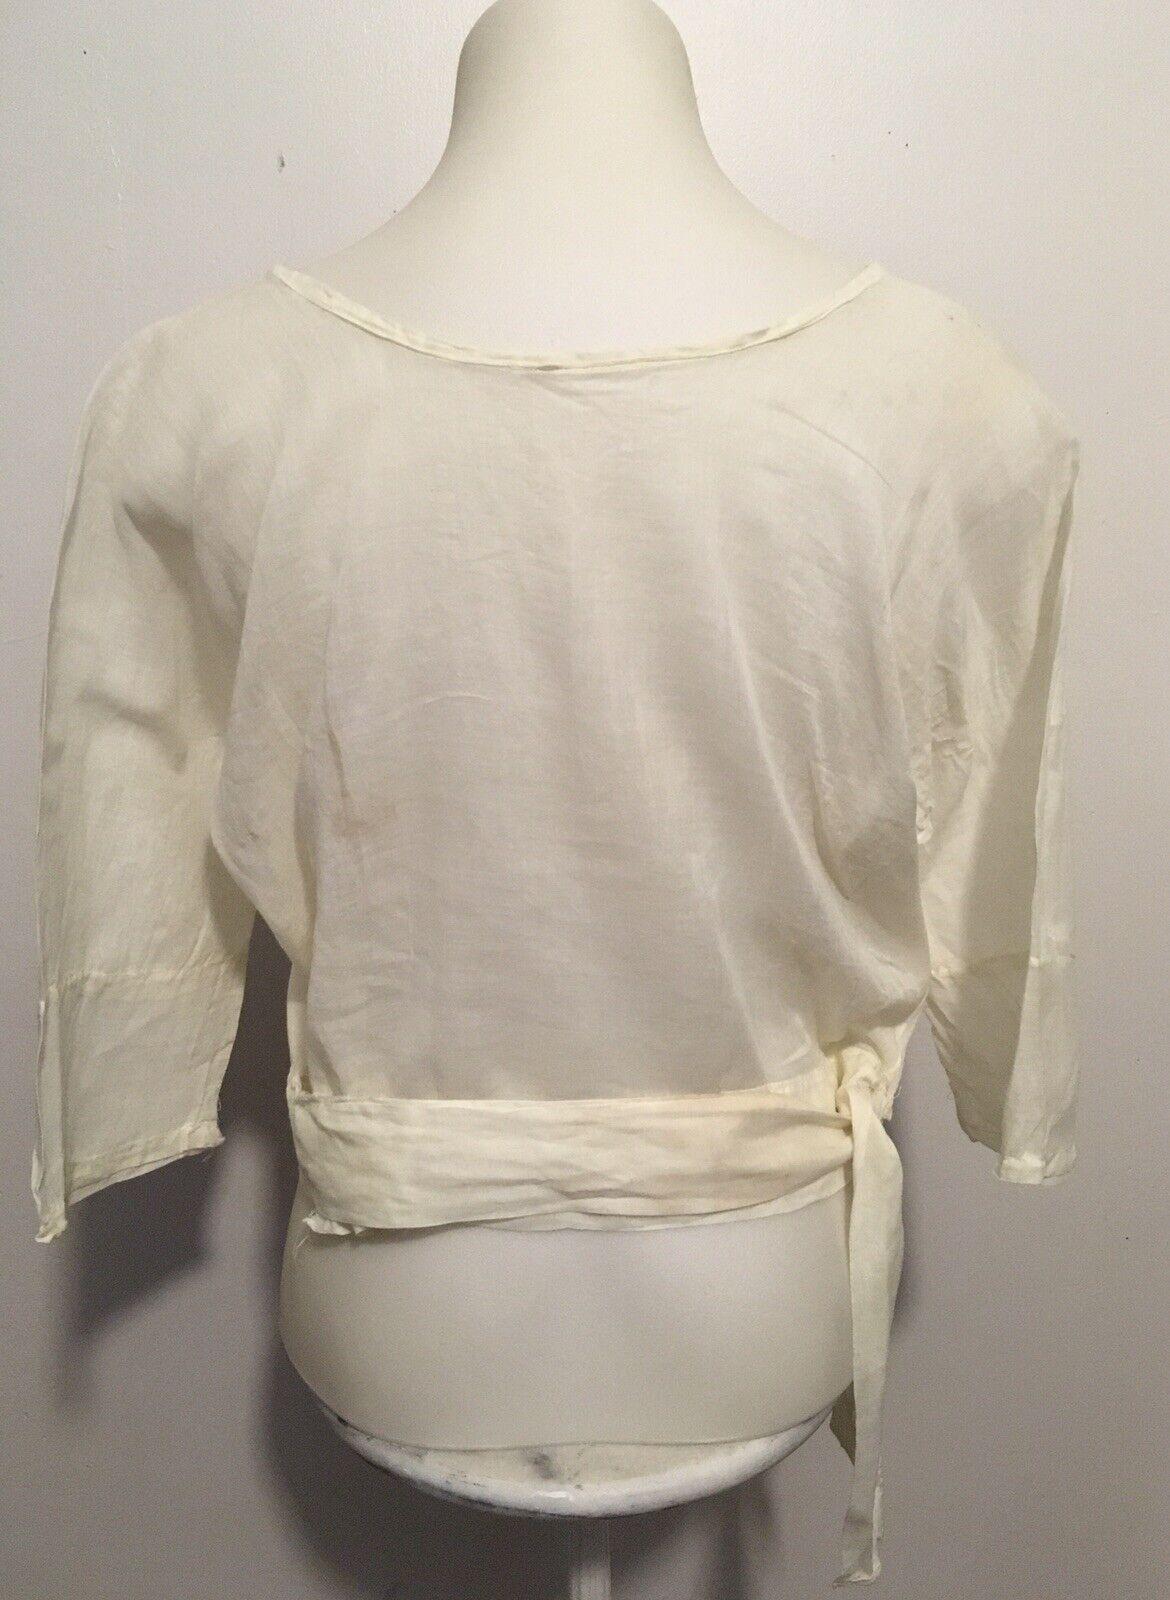 Antique Edwardian Victorian Shirtwaist Blouse - image 12